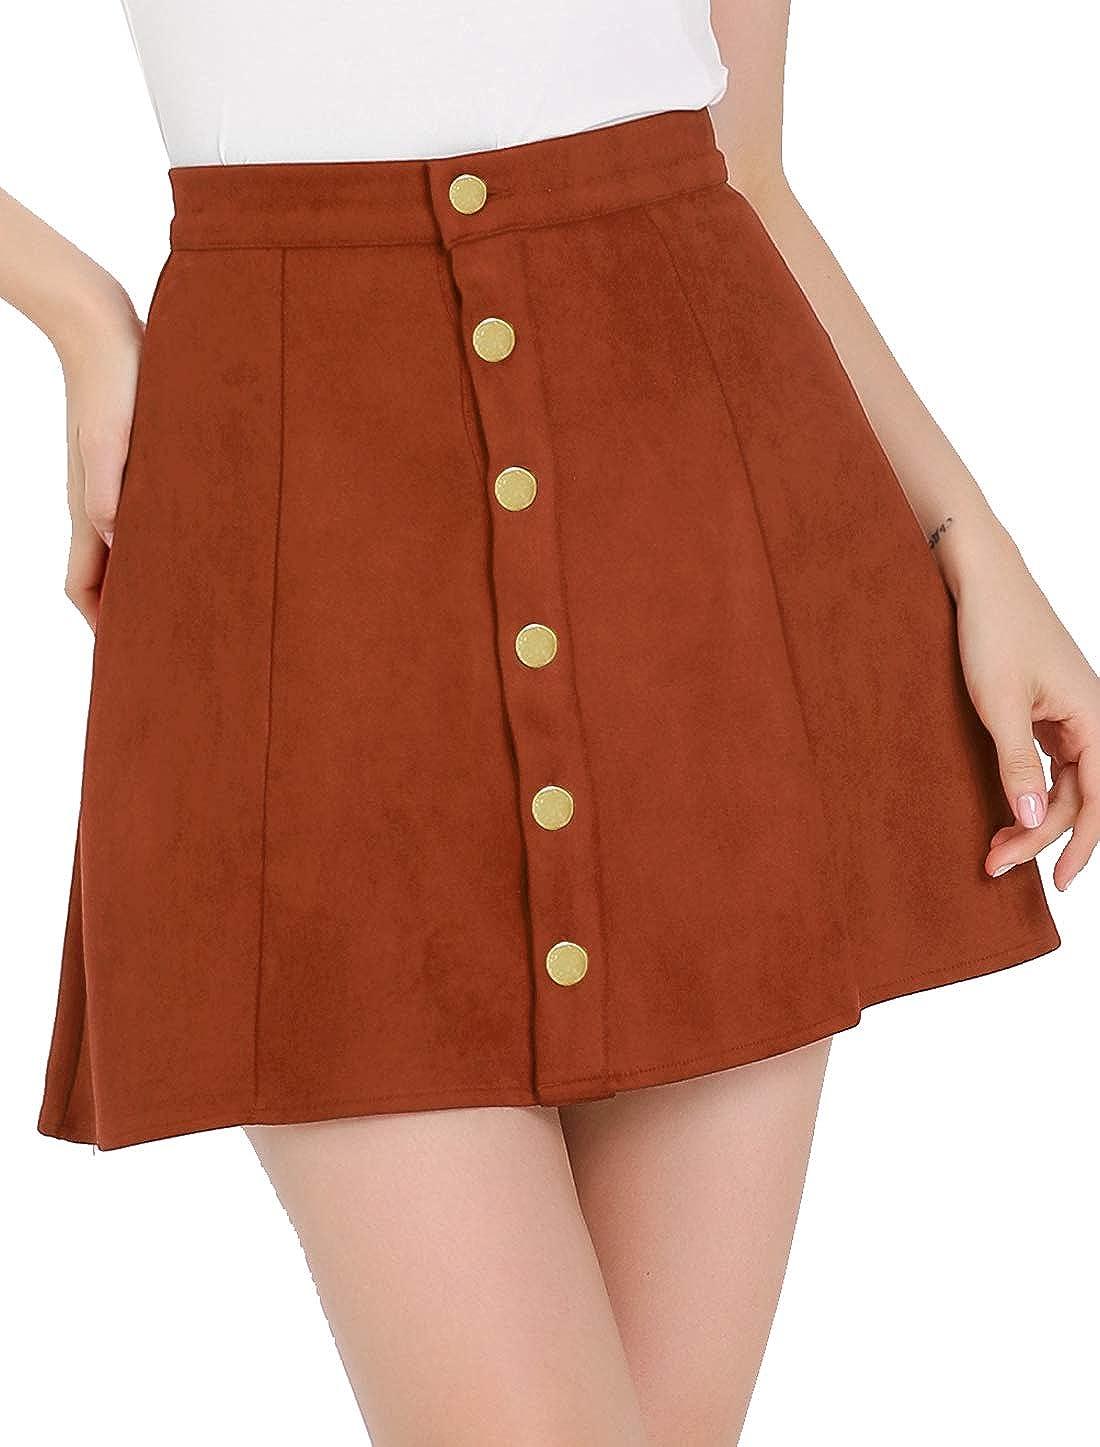 Allegra K Women's Faux Suede Button Closure A-Line High Waisted Flared Mini Short Skirt